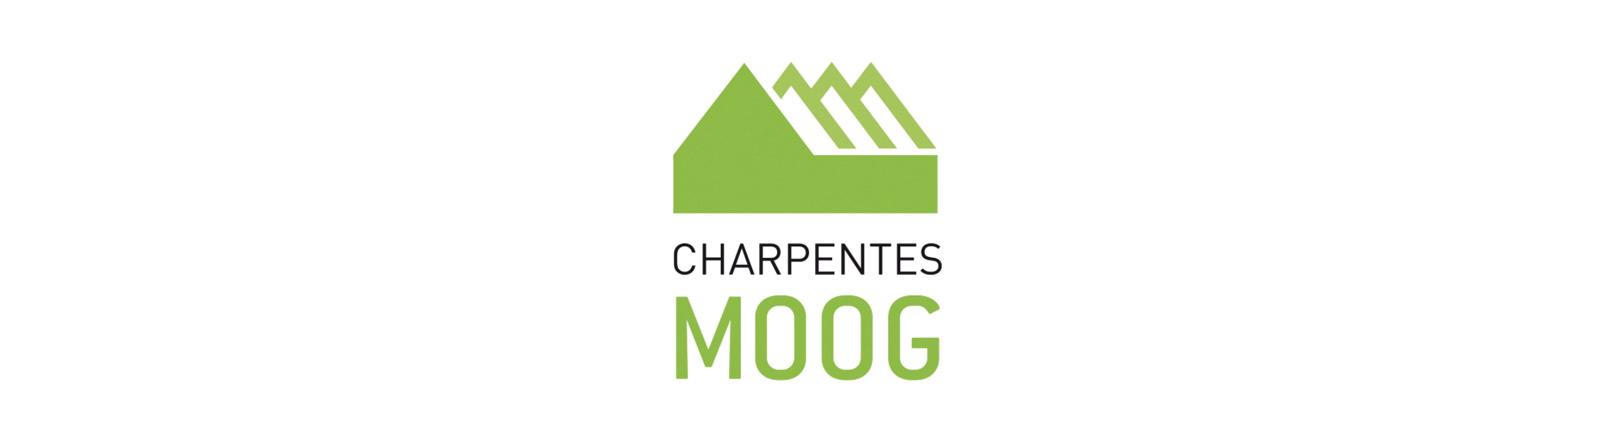 charpentes moog